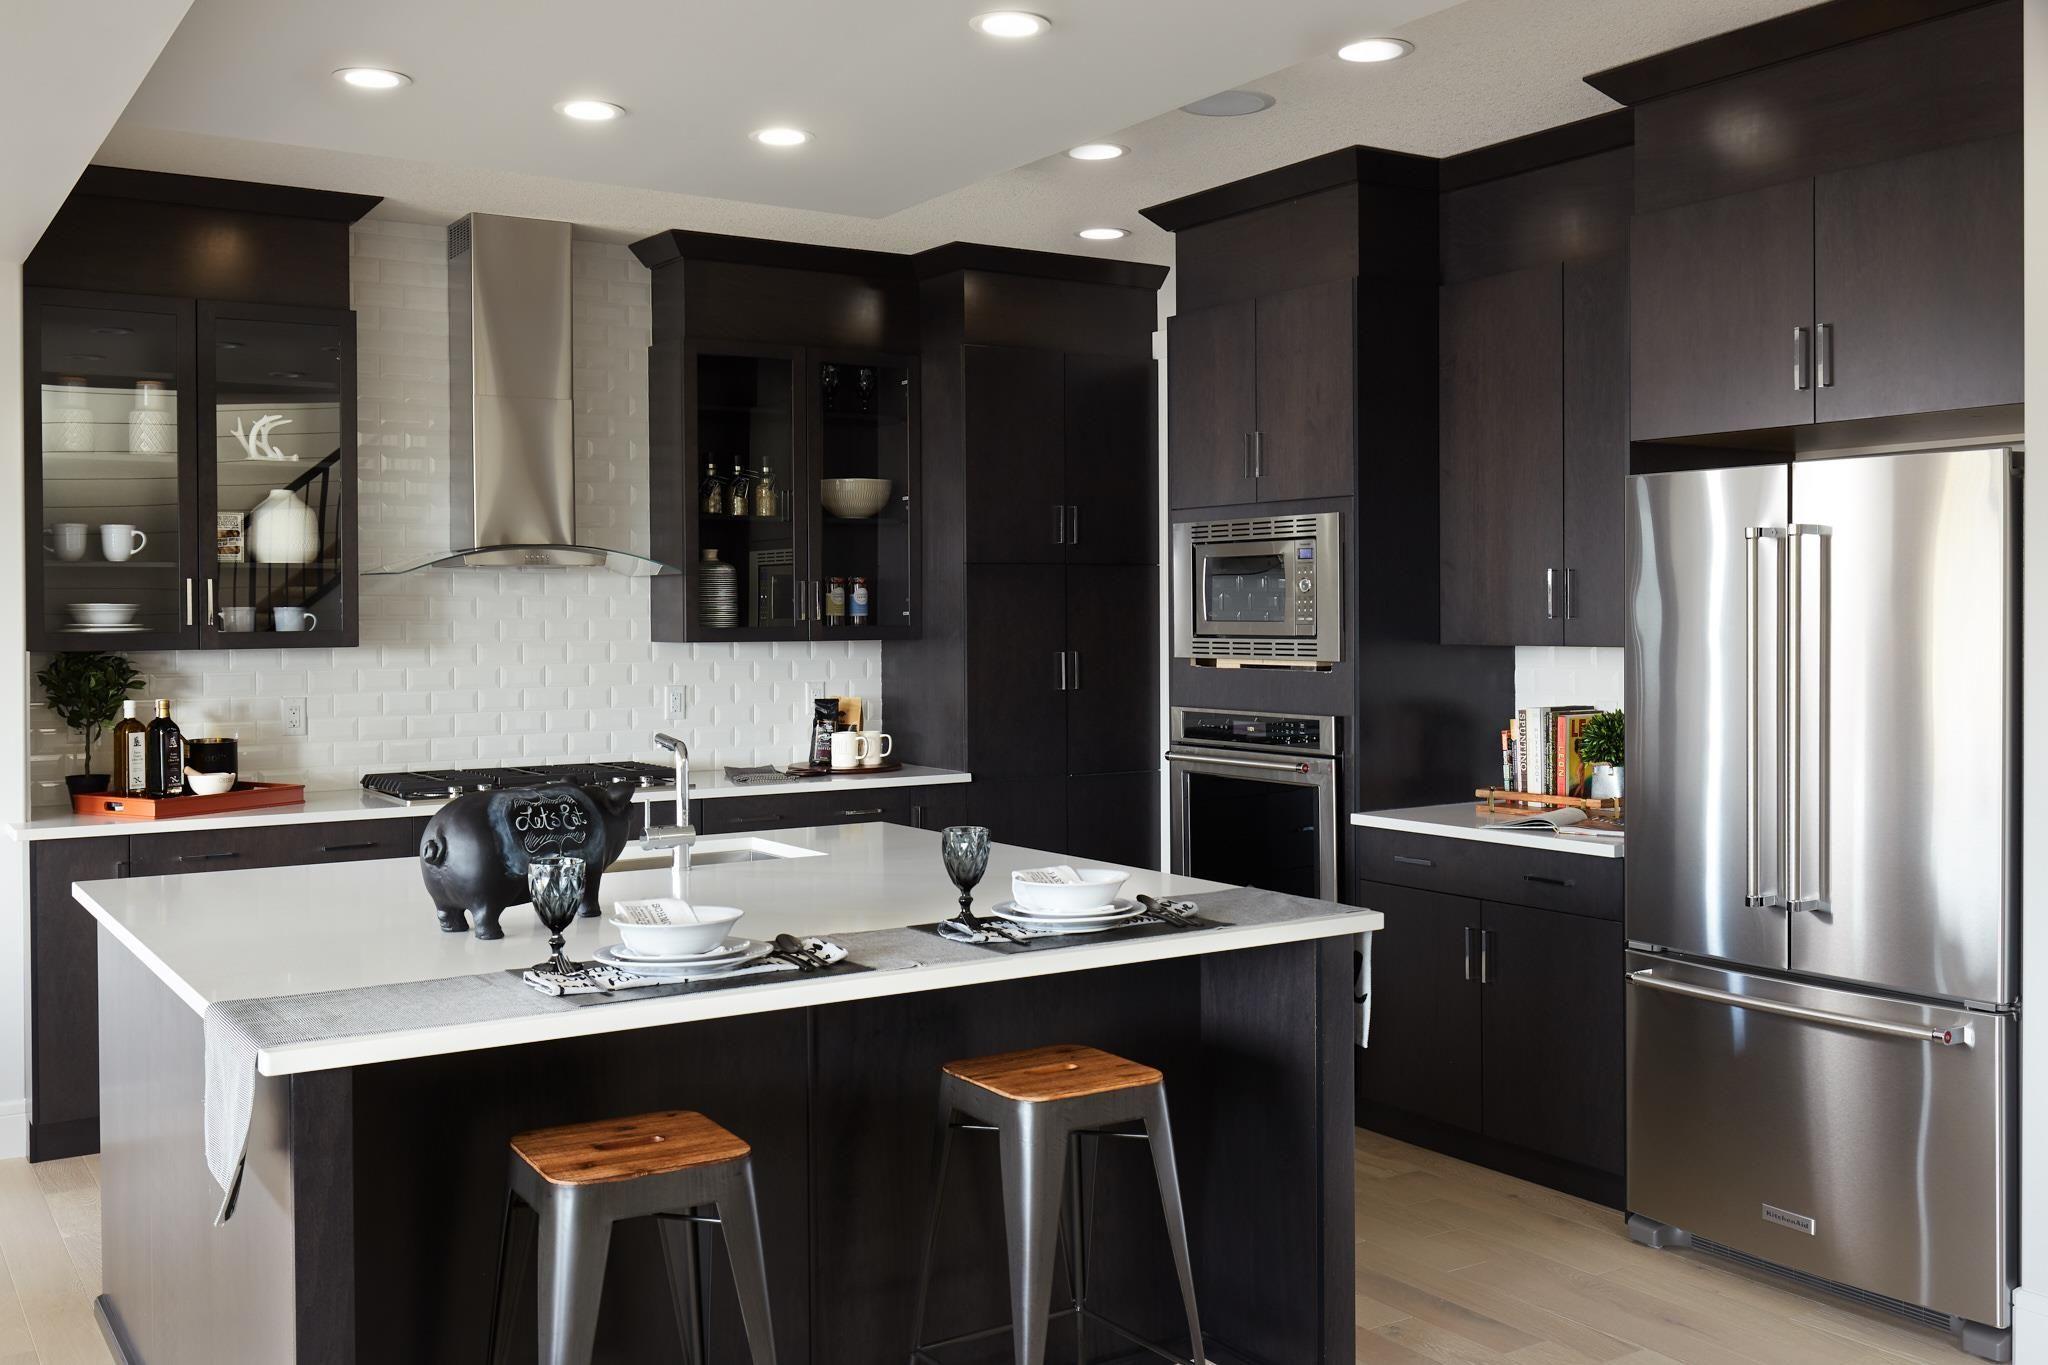 Main Photo: 2712 202 Street in Edmonton: Zone 57 House for sale : MLS®# E4265922